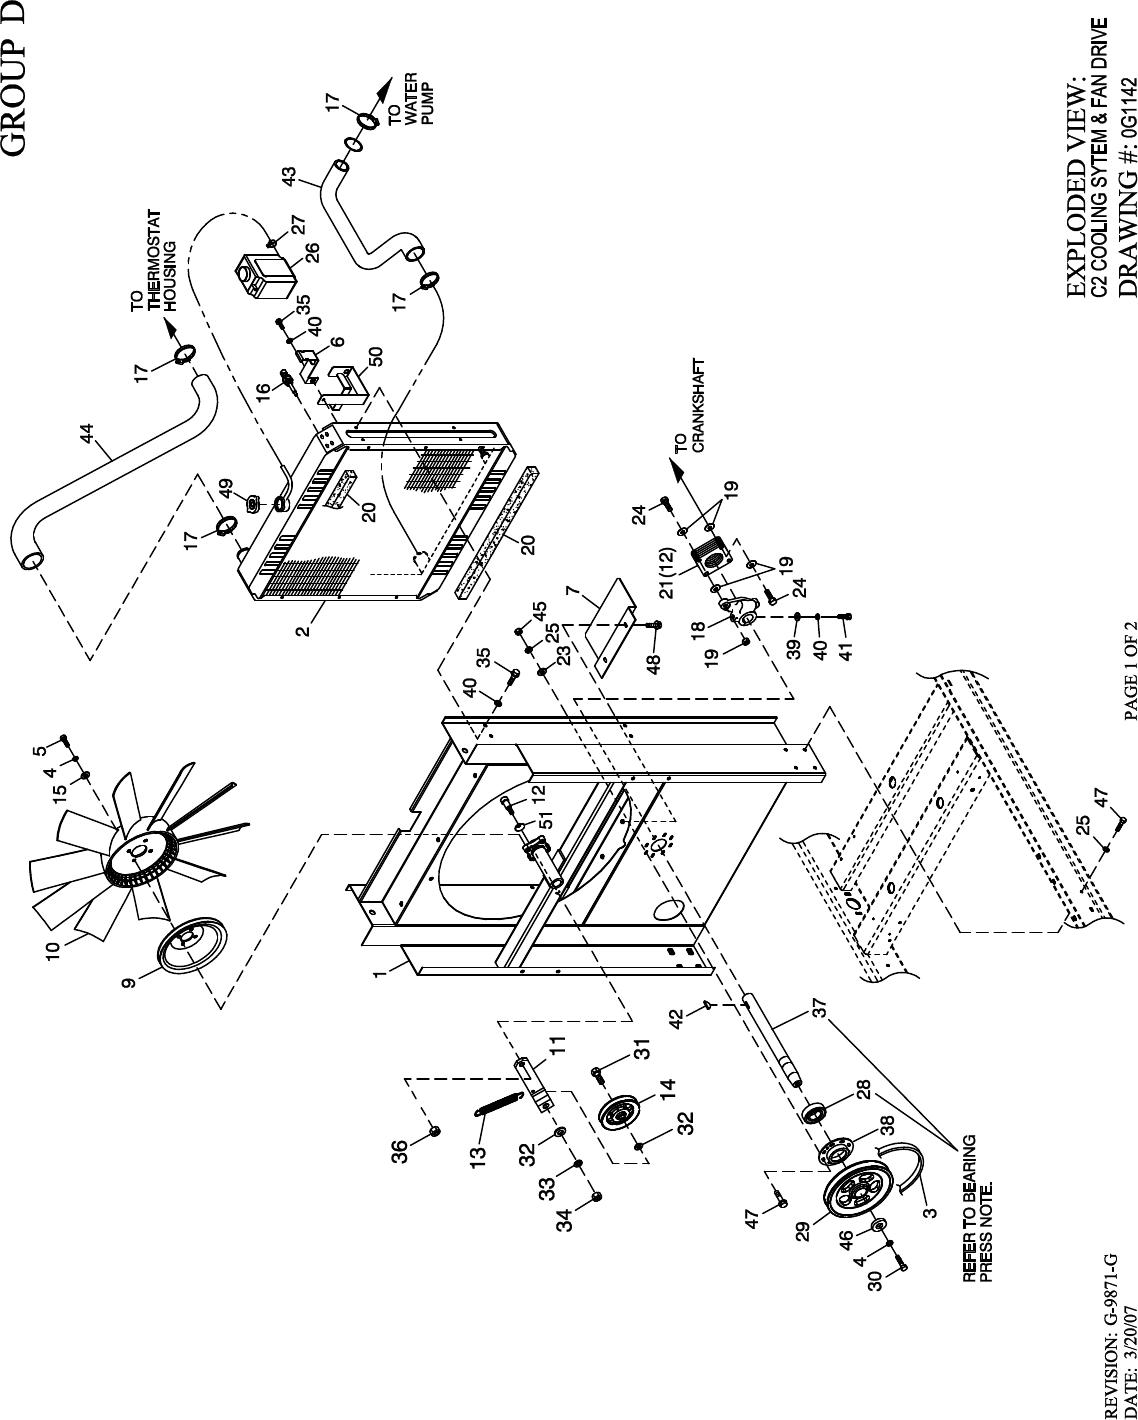 Generac Power Systems 2 4L Users Manual Cover112 RevA 05 07